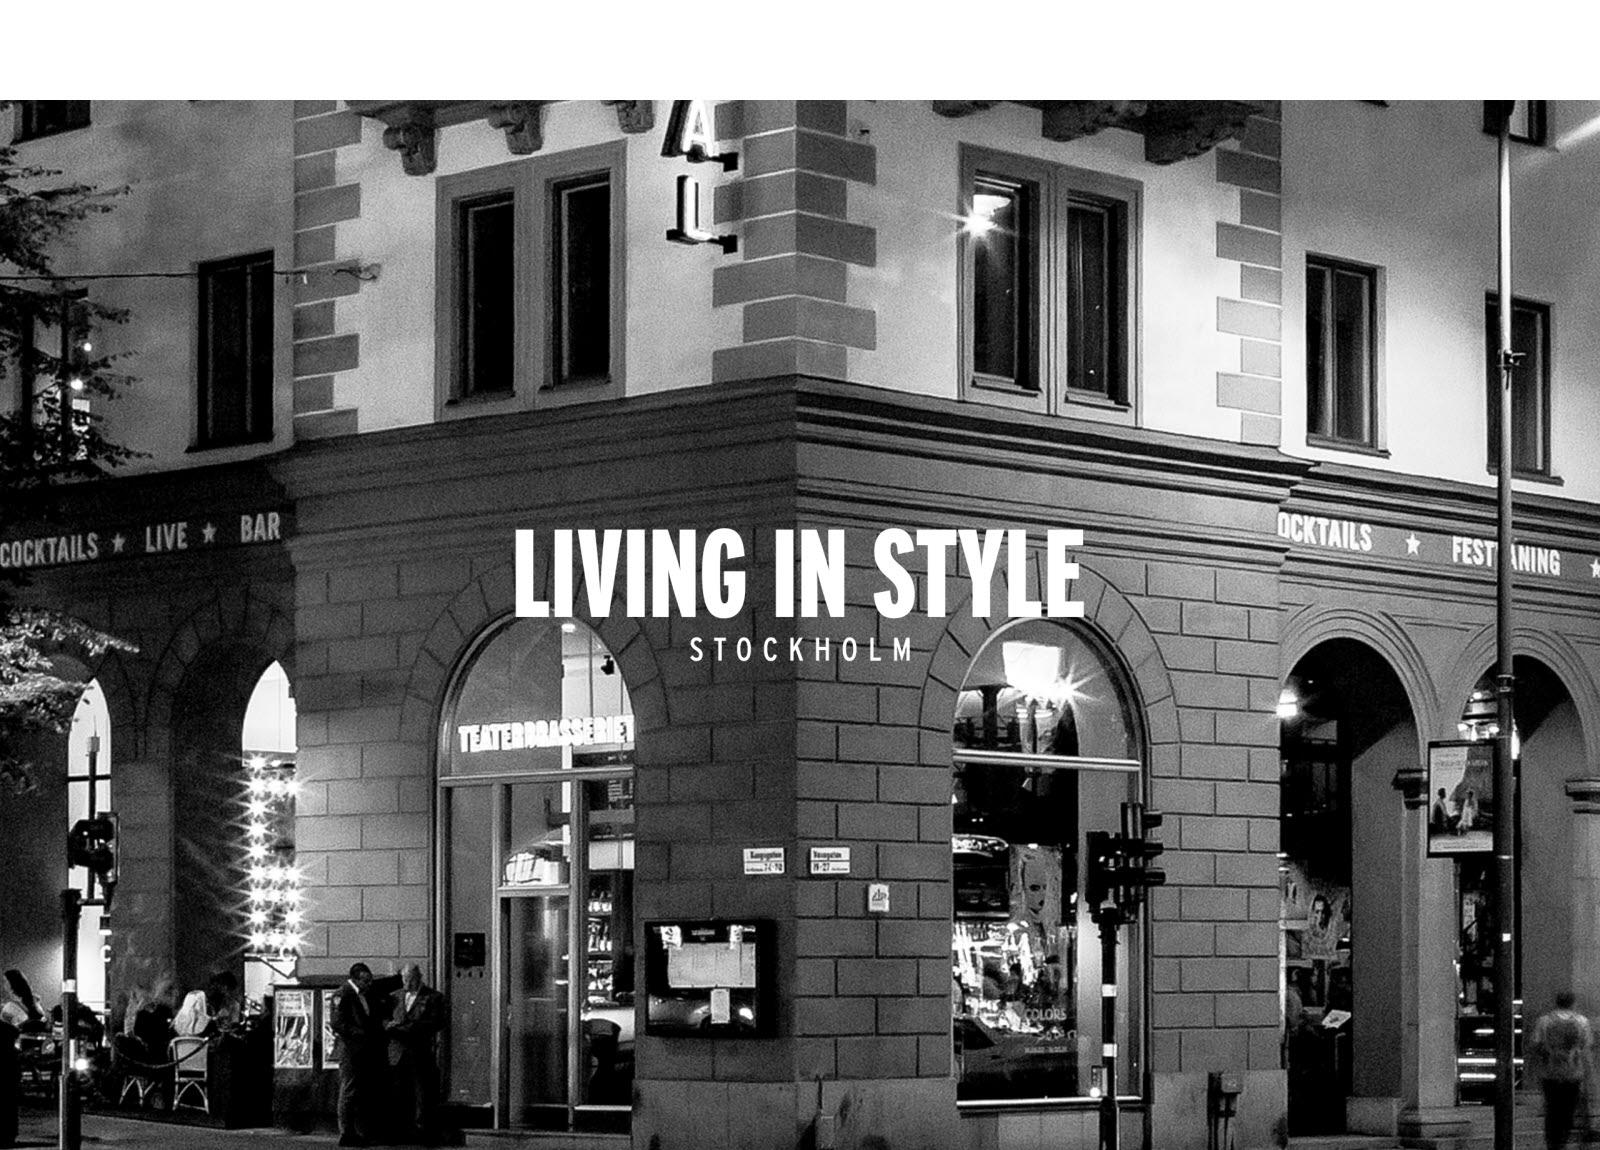 grand central by scandic hotell stockholm. Black Bedroom Furniture Sets. Home Design Ideas